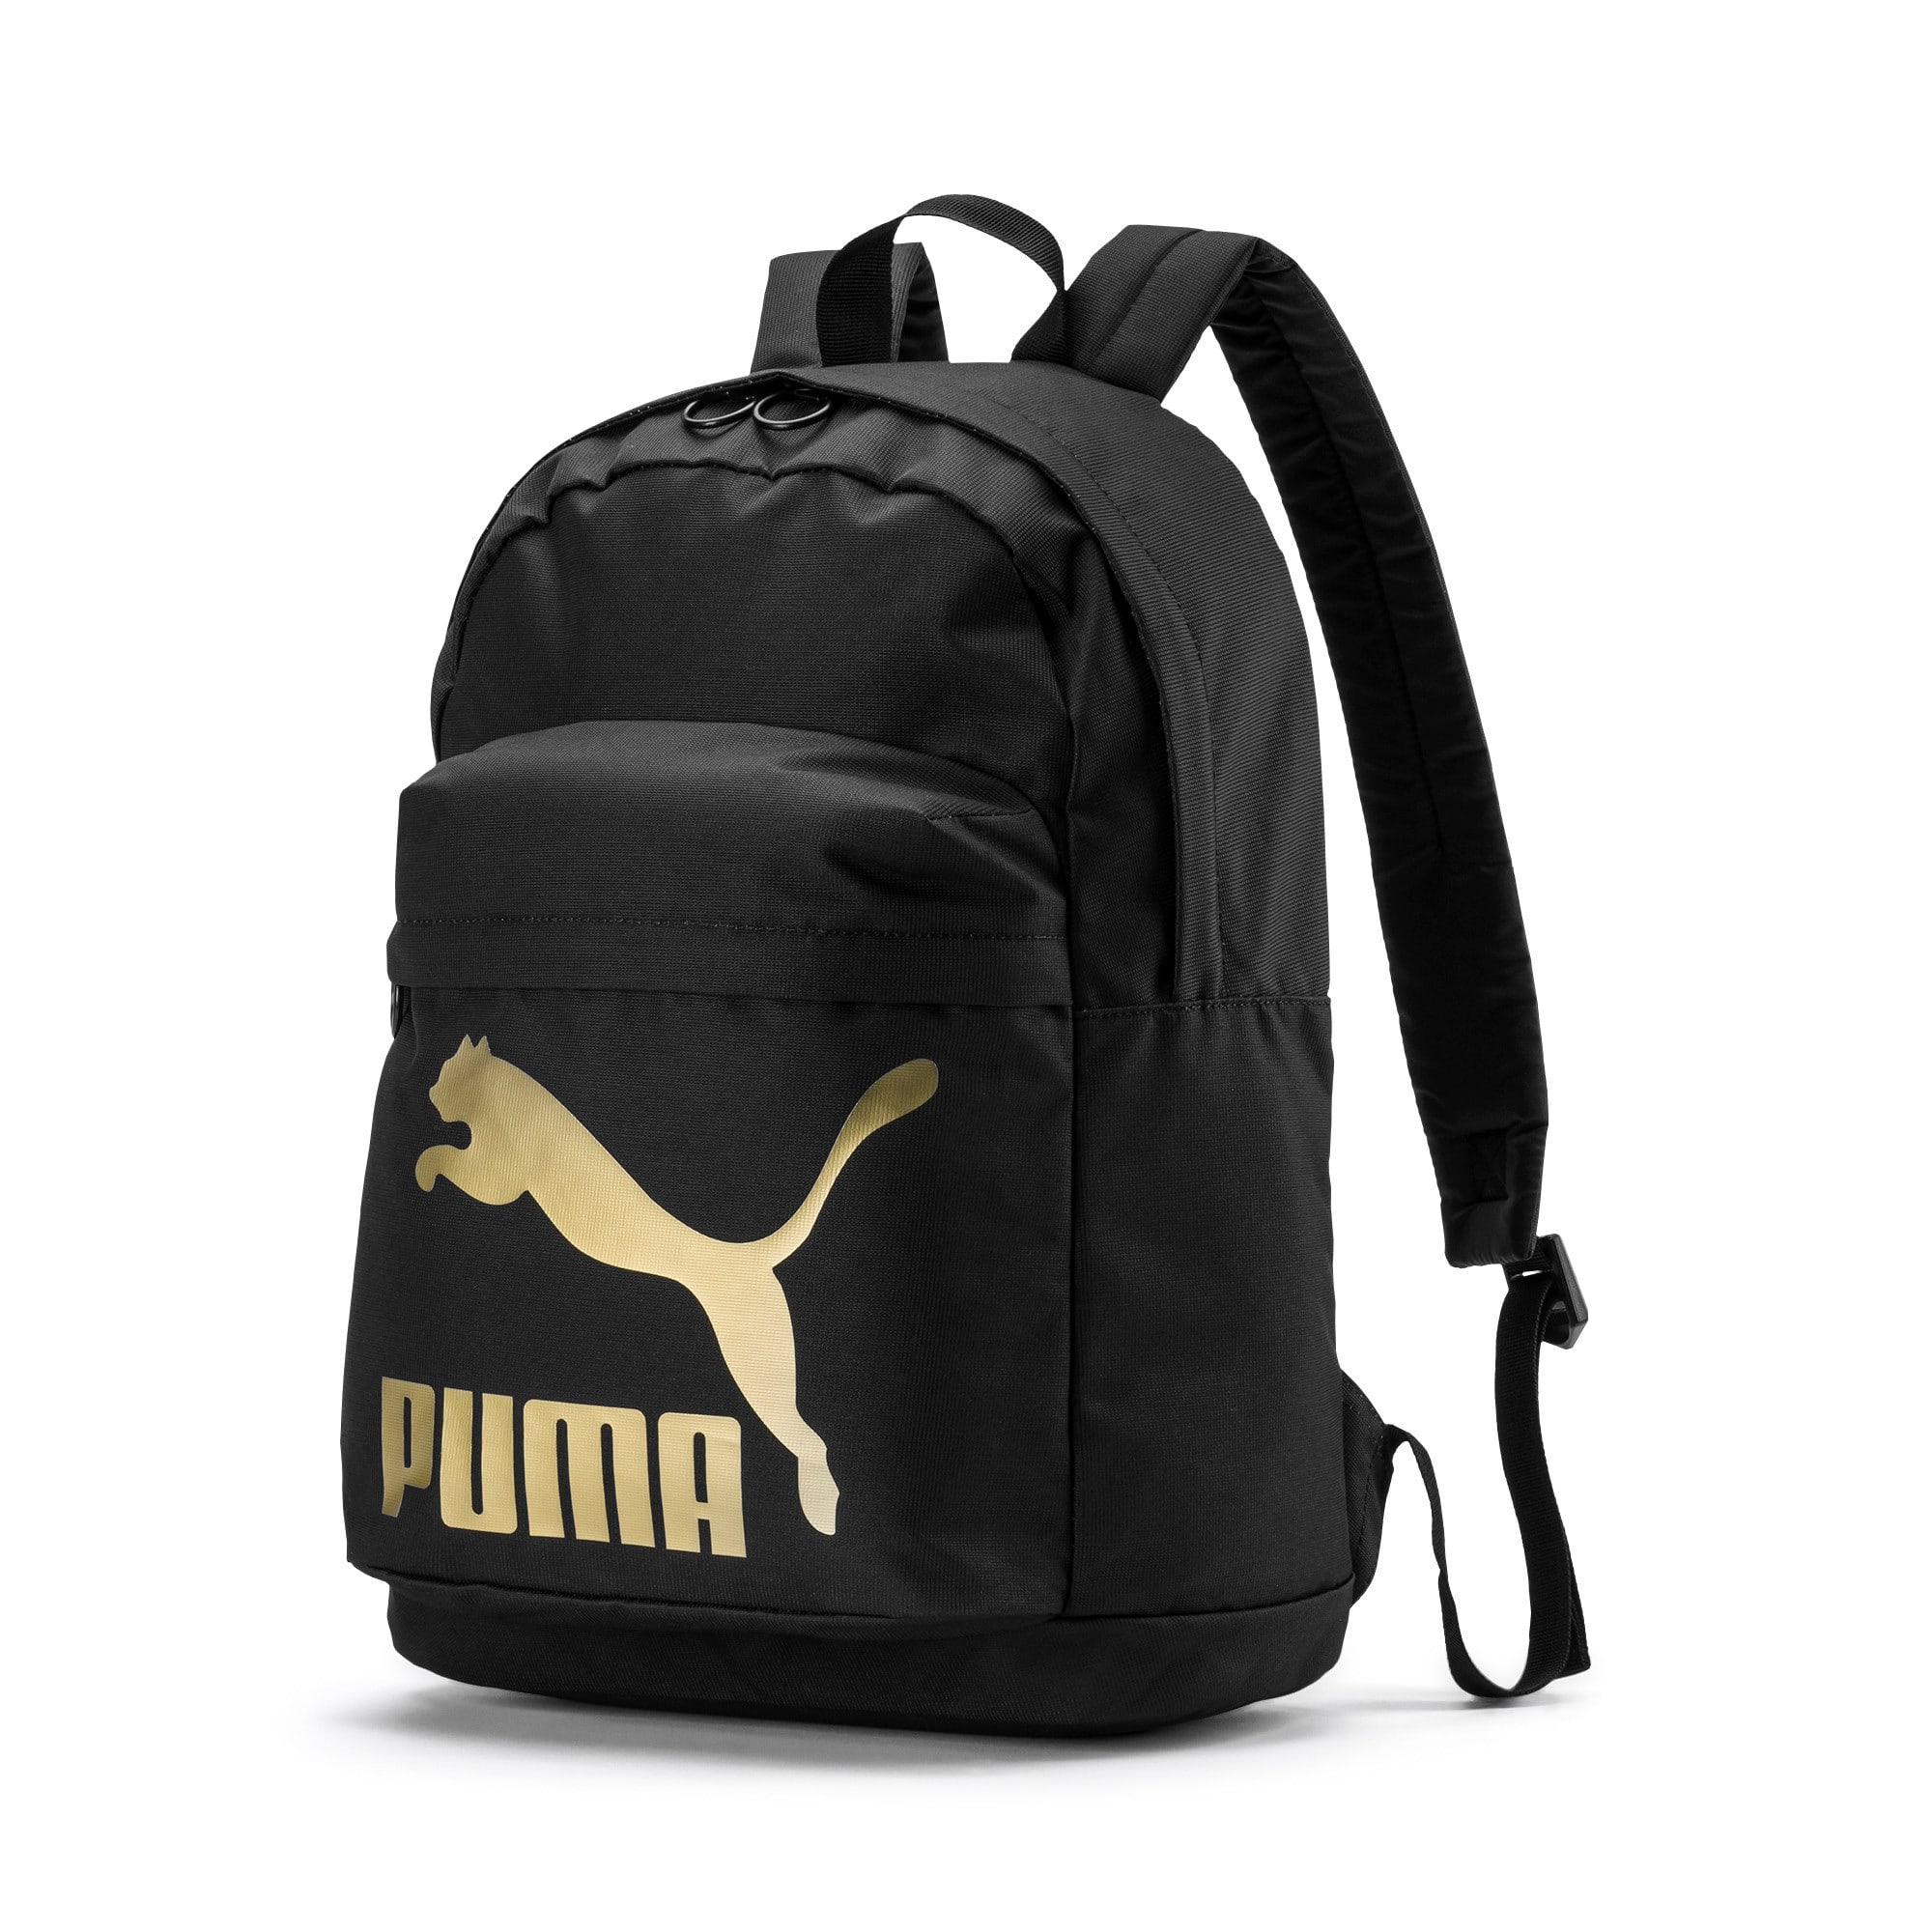 Thumbnail 1 of オリジナルス バックパック 20L, Puma Black, medium-JPN